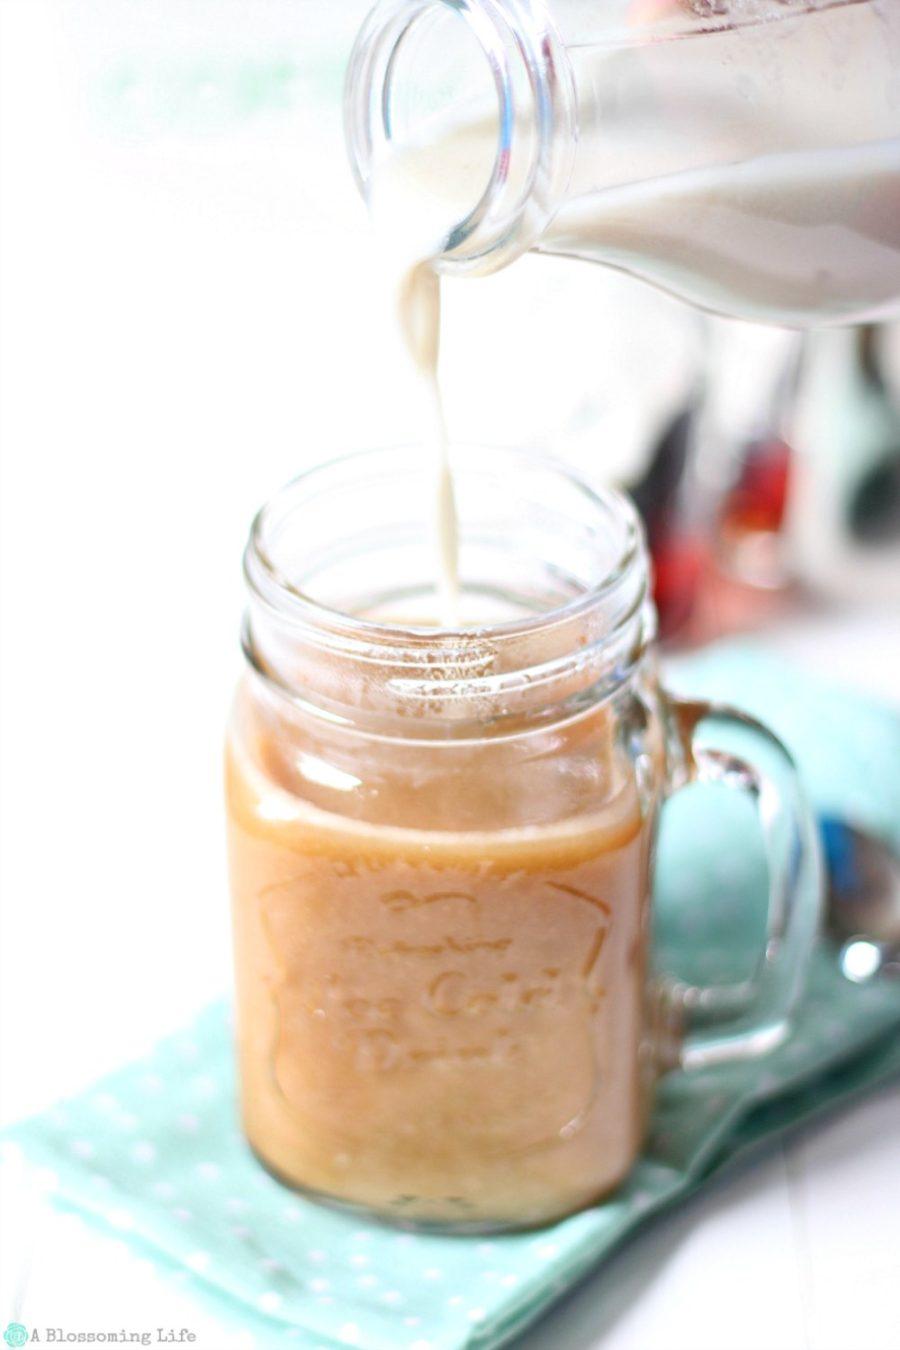 Homemade Coffee Creamer With Dairy Free Option